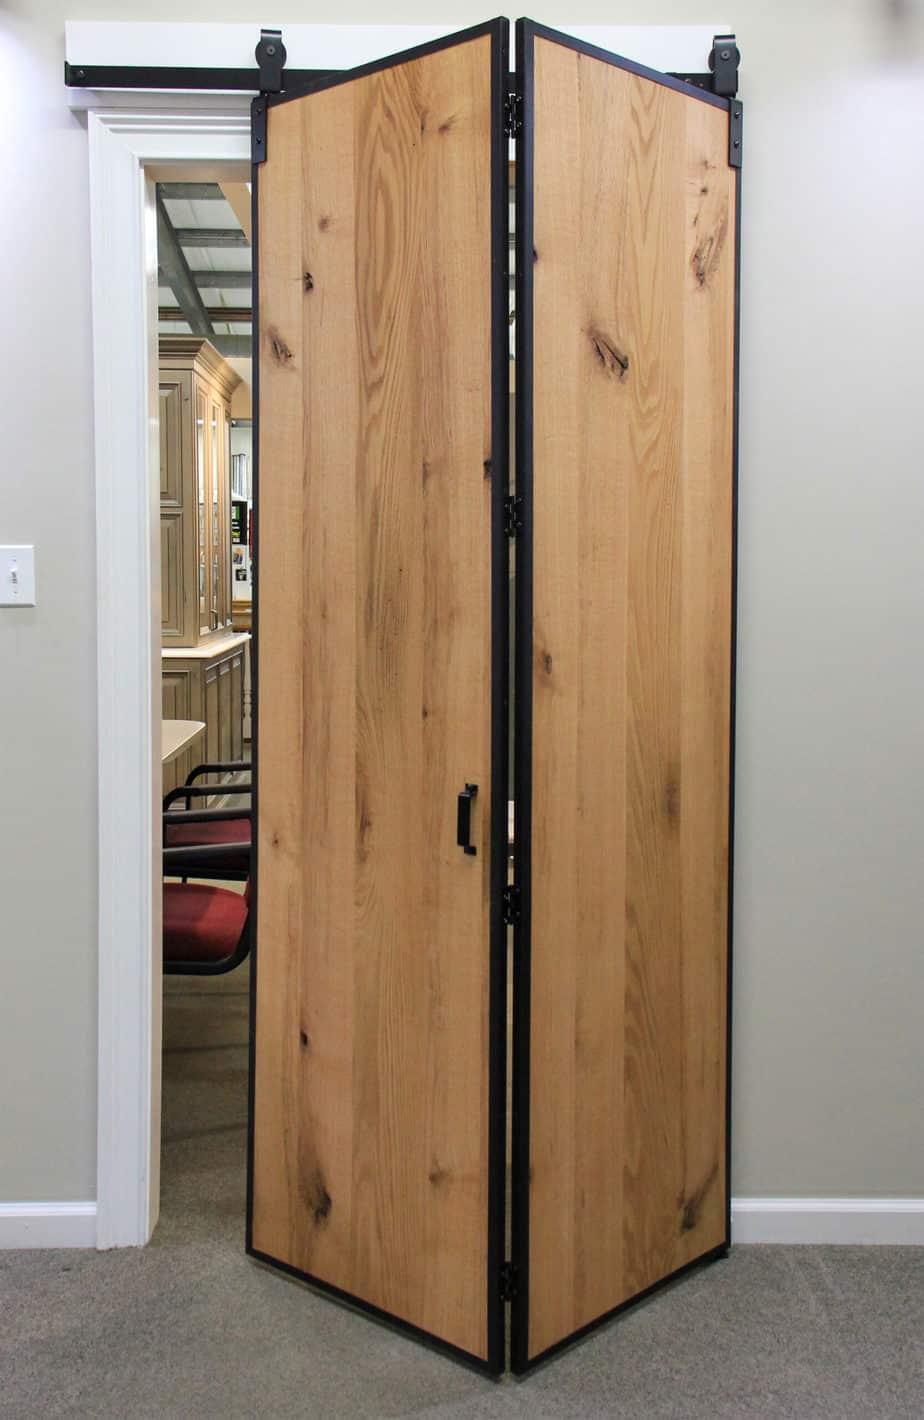 Partially closed Barnfold folding barn door hardware and Barn Door Edge Wrap in a showroom display